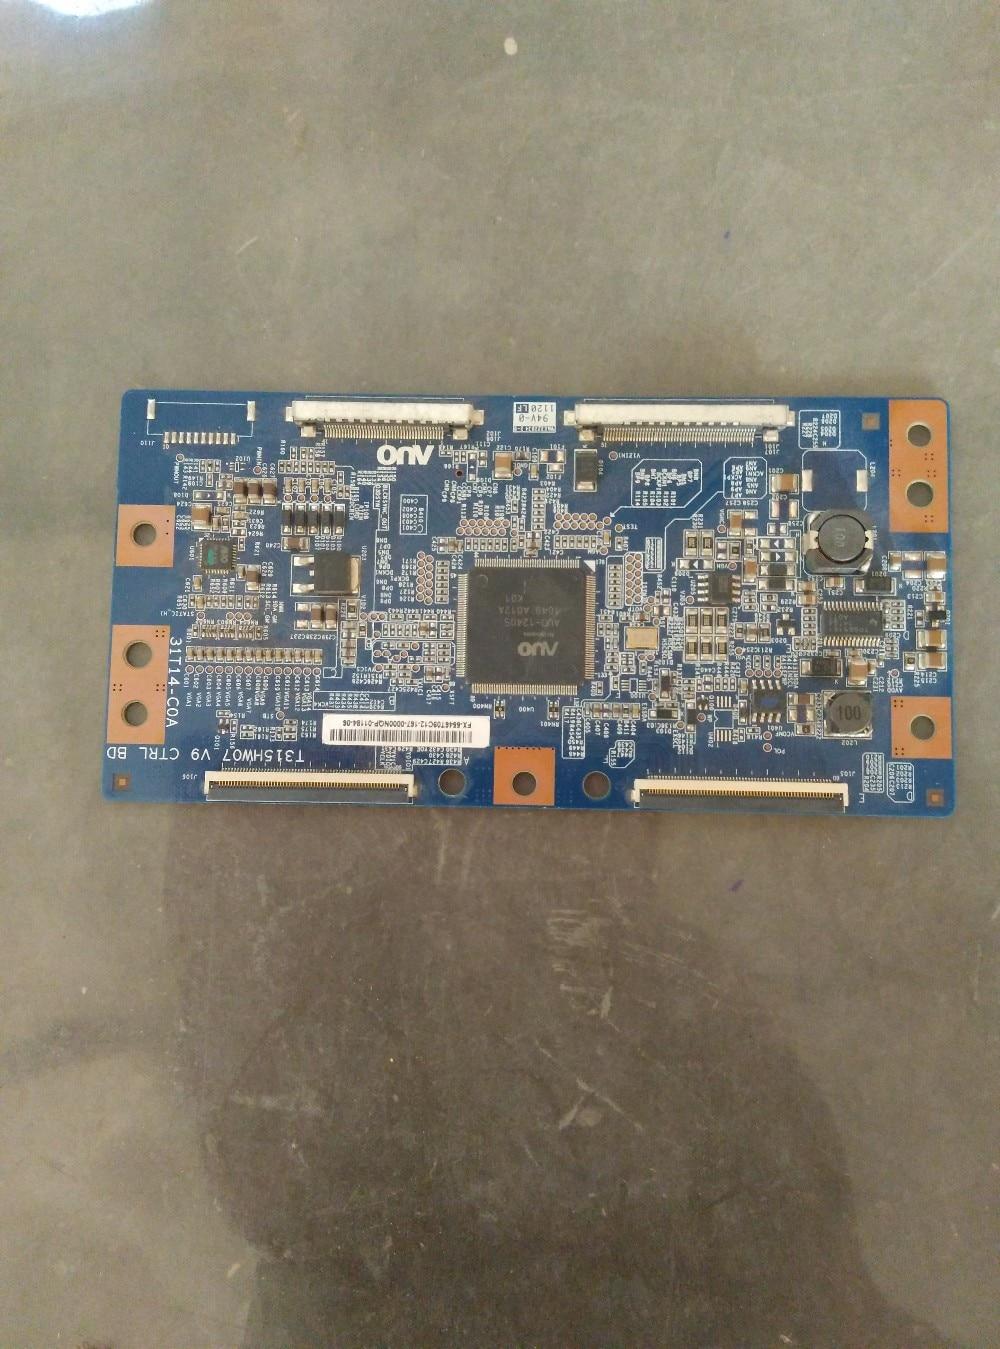 T315HW07 V9 CTRL BD 31T14-C0A Logic Board voennoplennye v shaxterske 31 07 2014